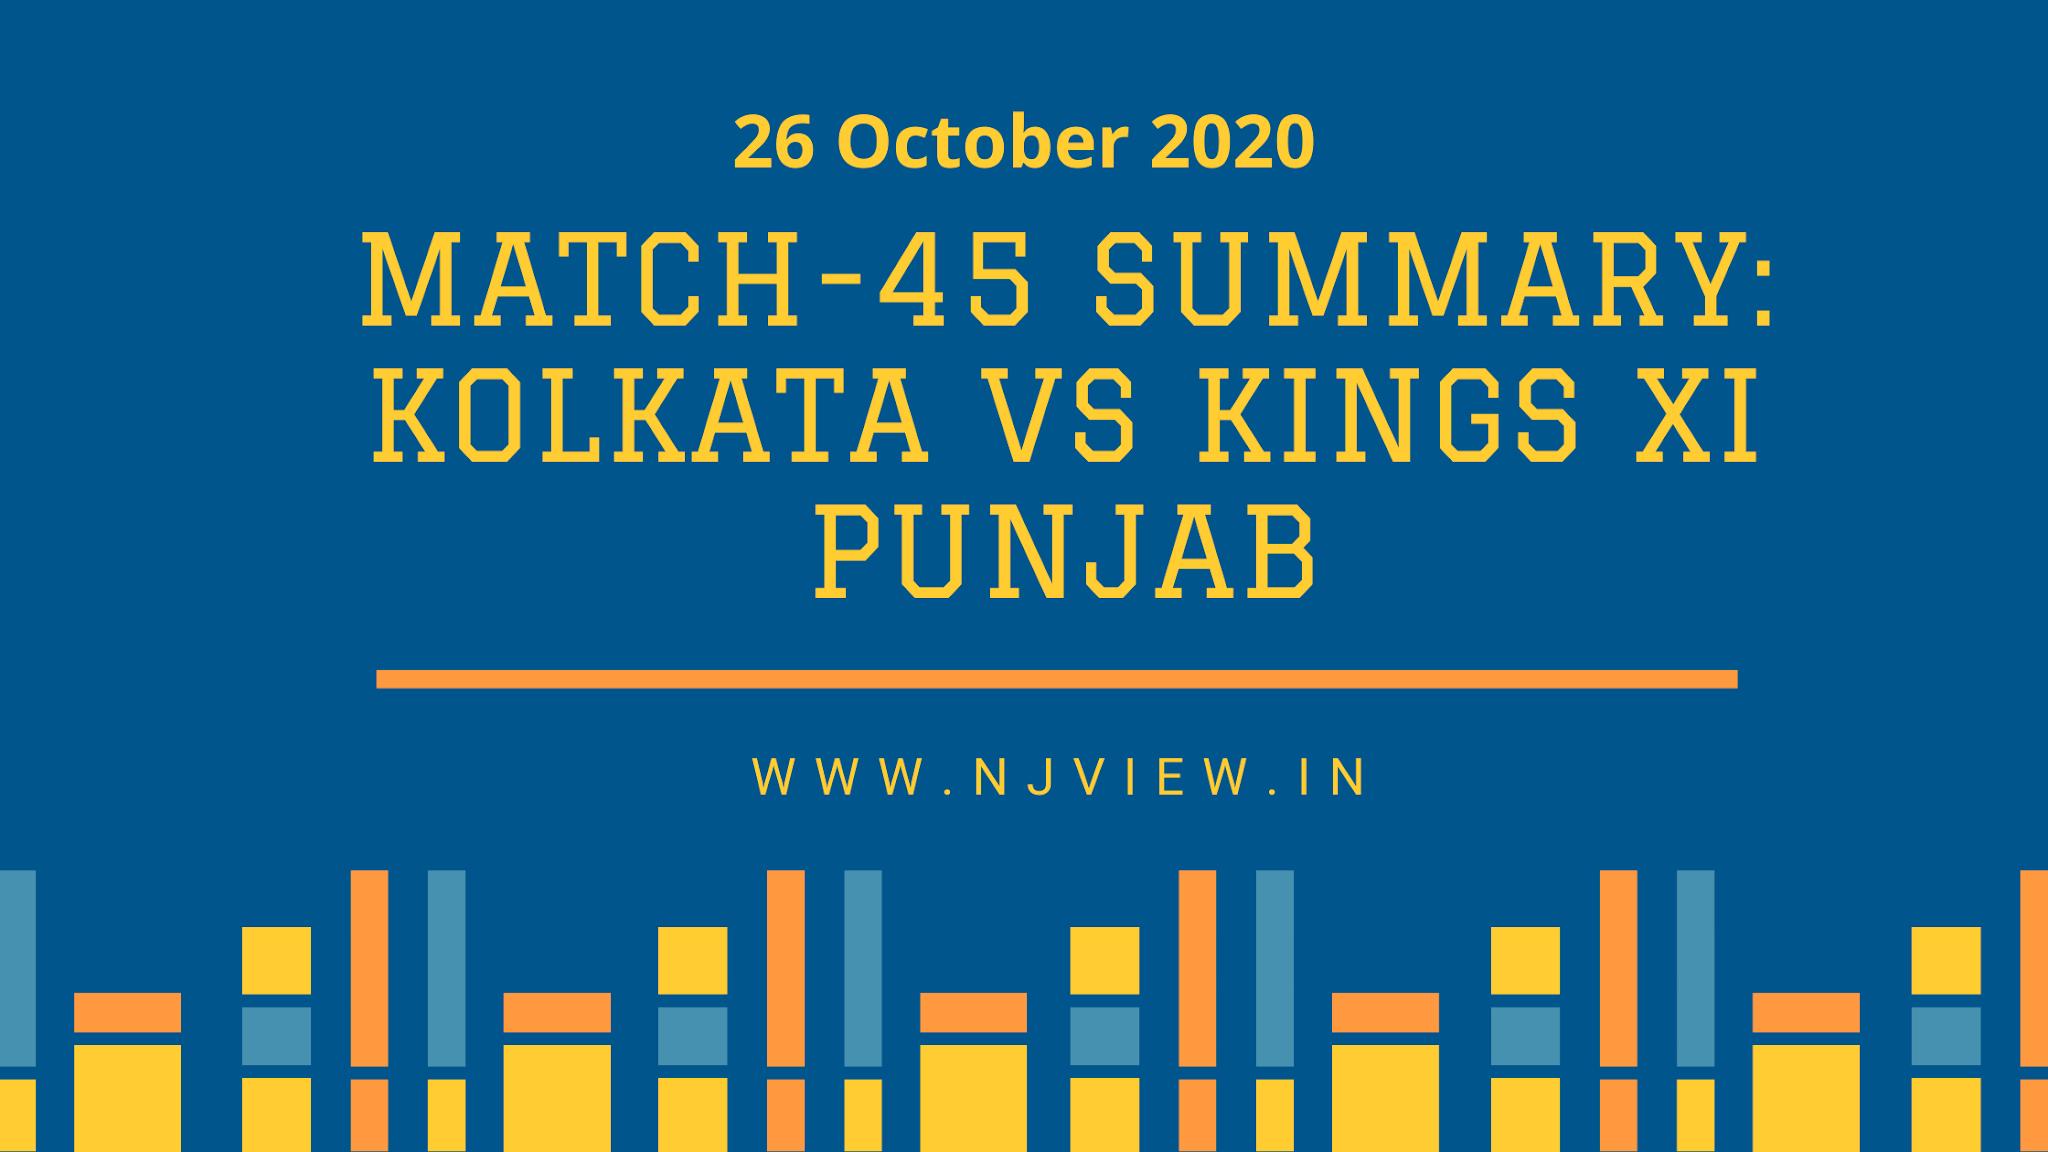 Match-45 Summary: KOLKATA VS Kings XI Punjab